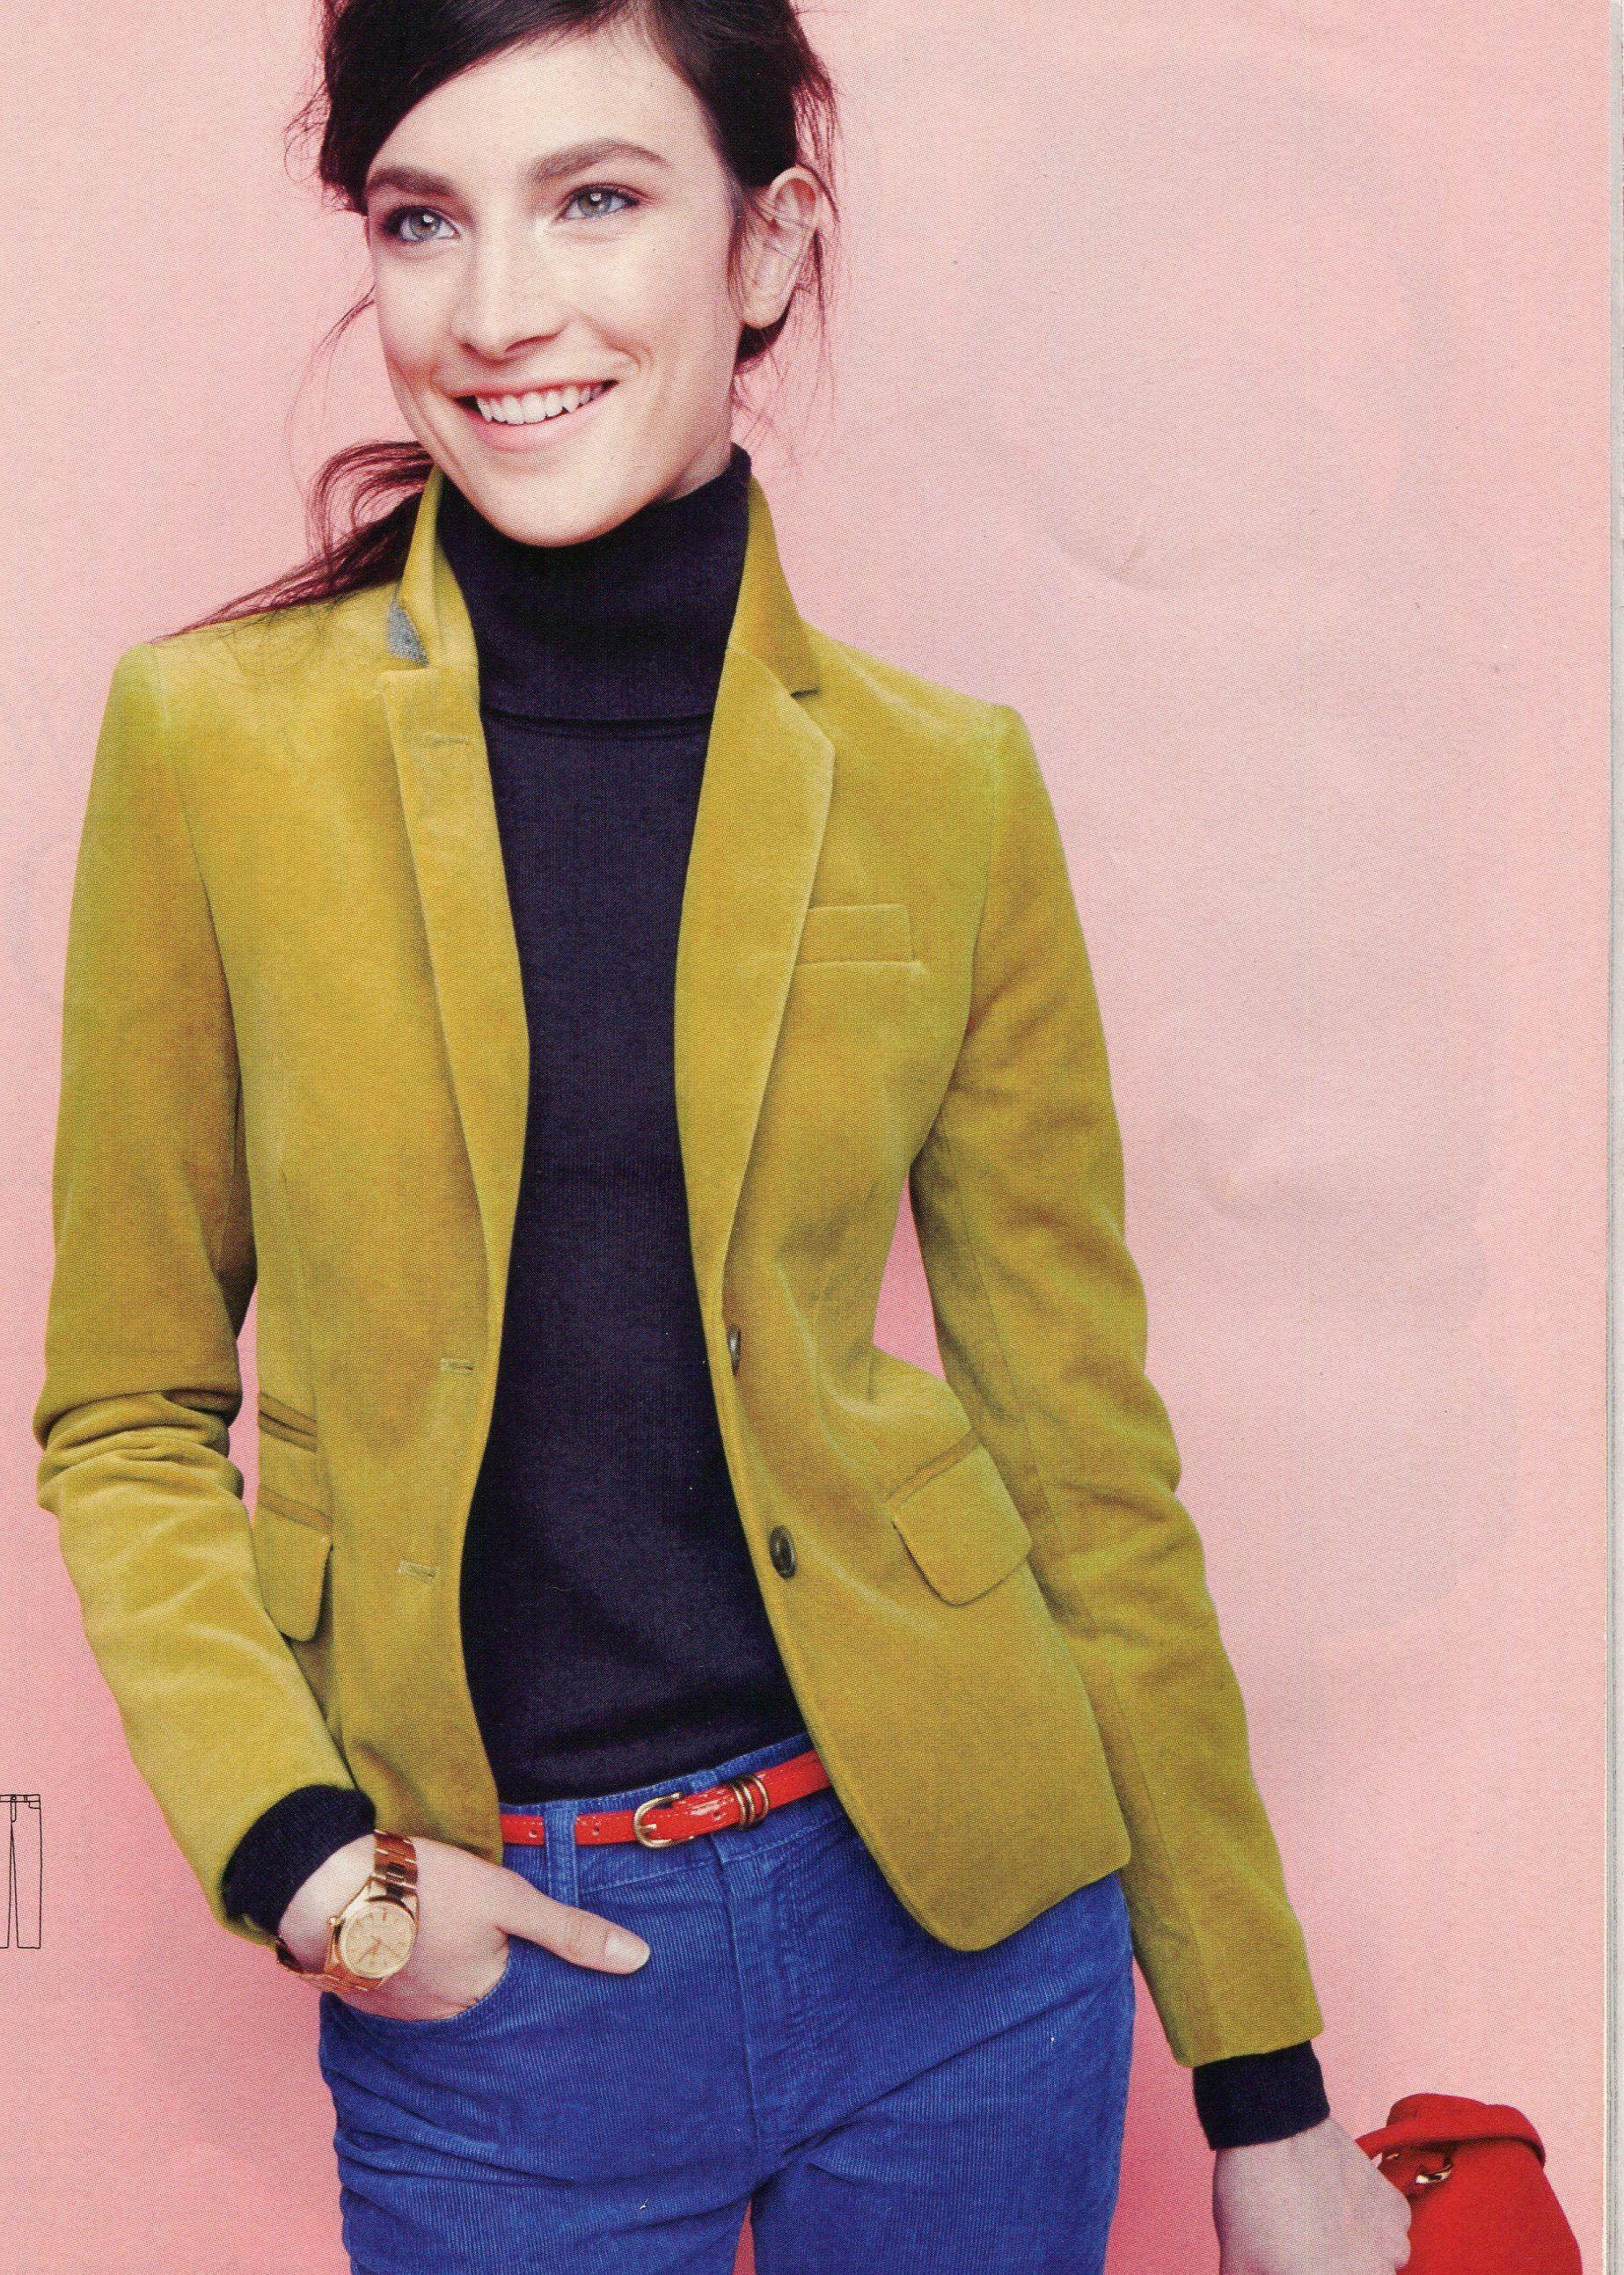 ba98dc9414bb J.Crew - Velvet boyfriend jacket, turtleneck sweater, cords. | Fall ...